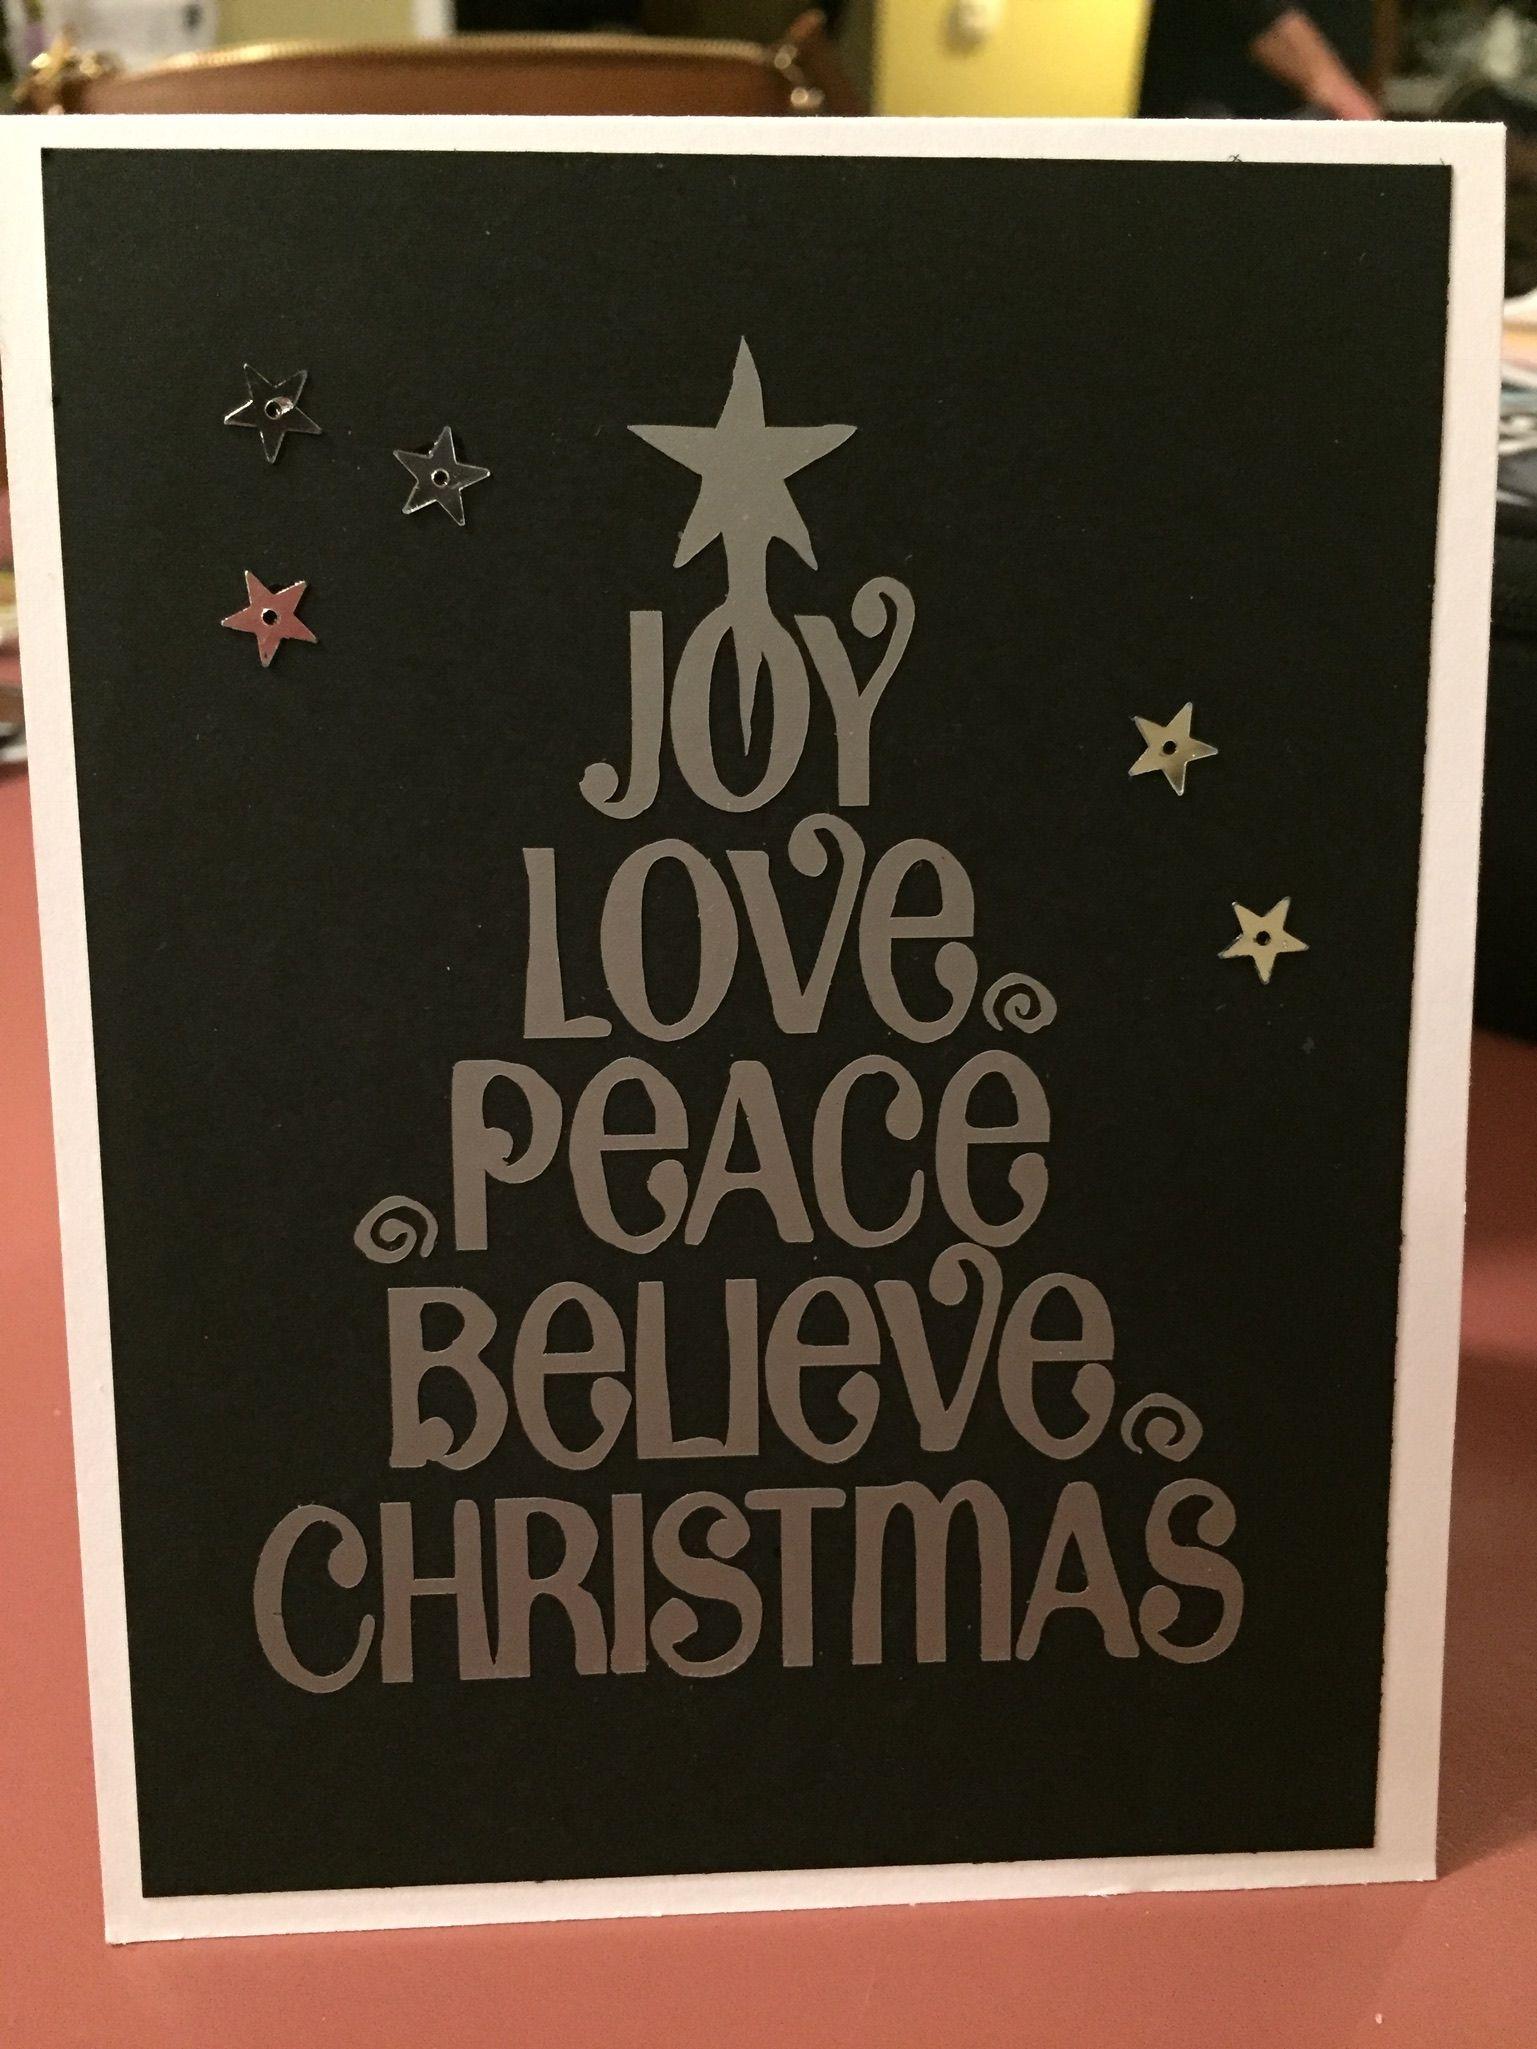 Pin by Reba Baird on 2017 Christmas Cards | Pinterest | Christmas ...